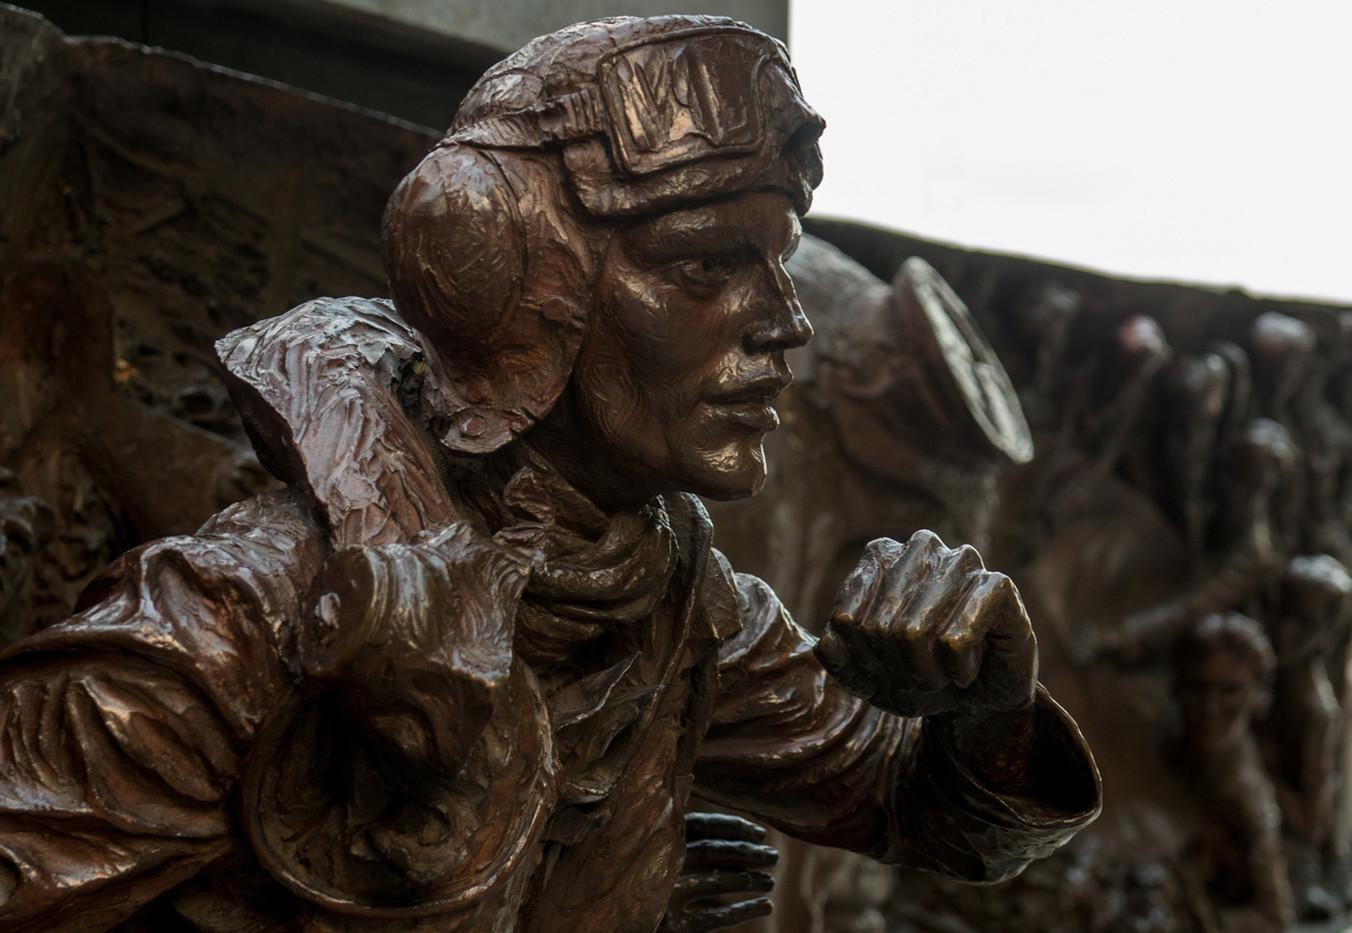 15 BATTLE OF BRITAIN MEMORIAL by Richard Brown